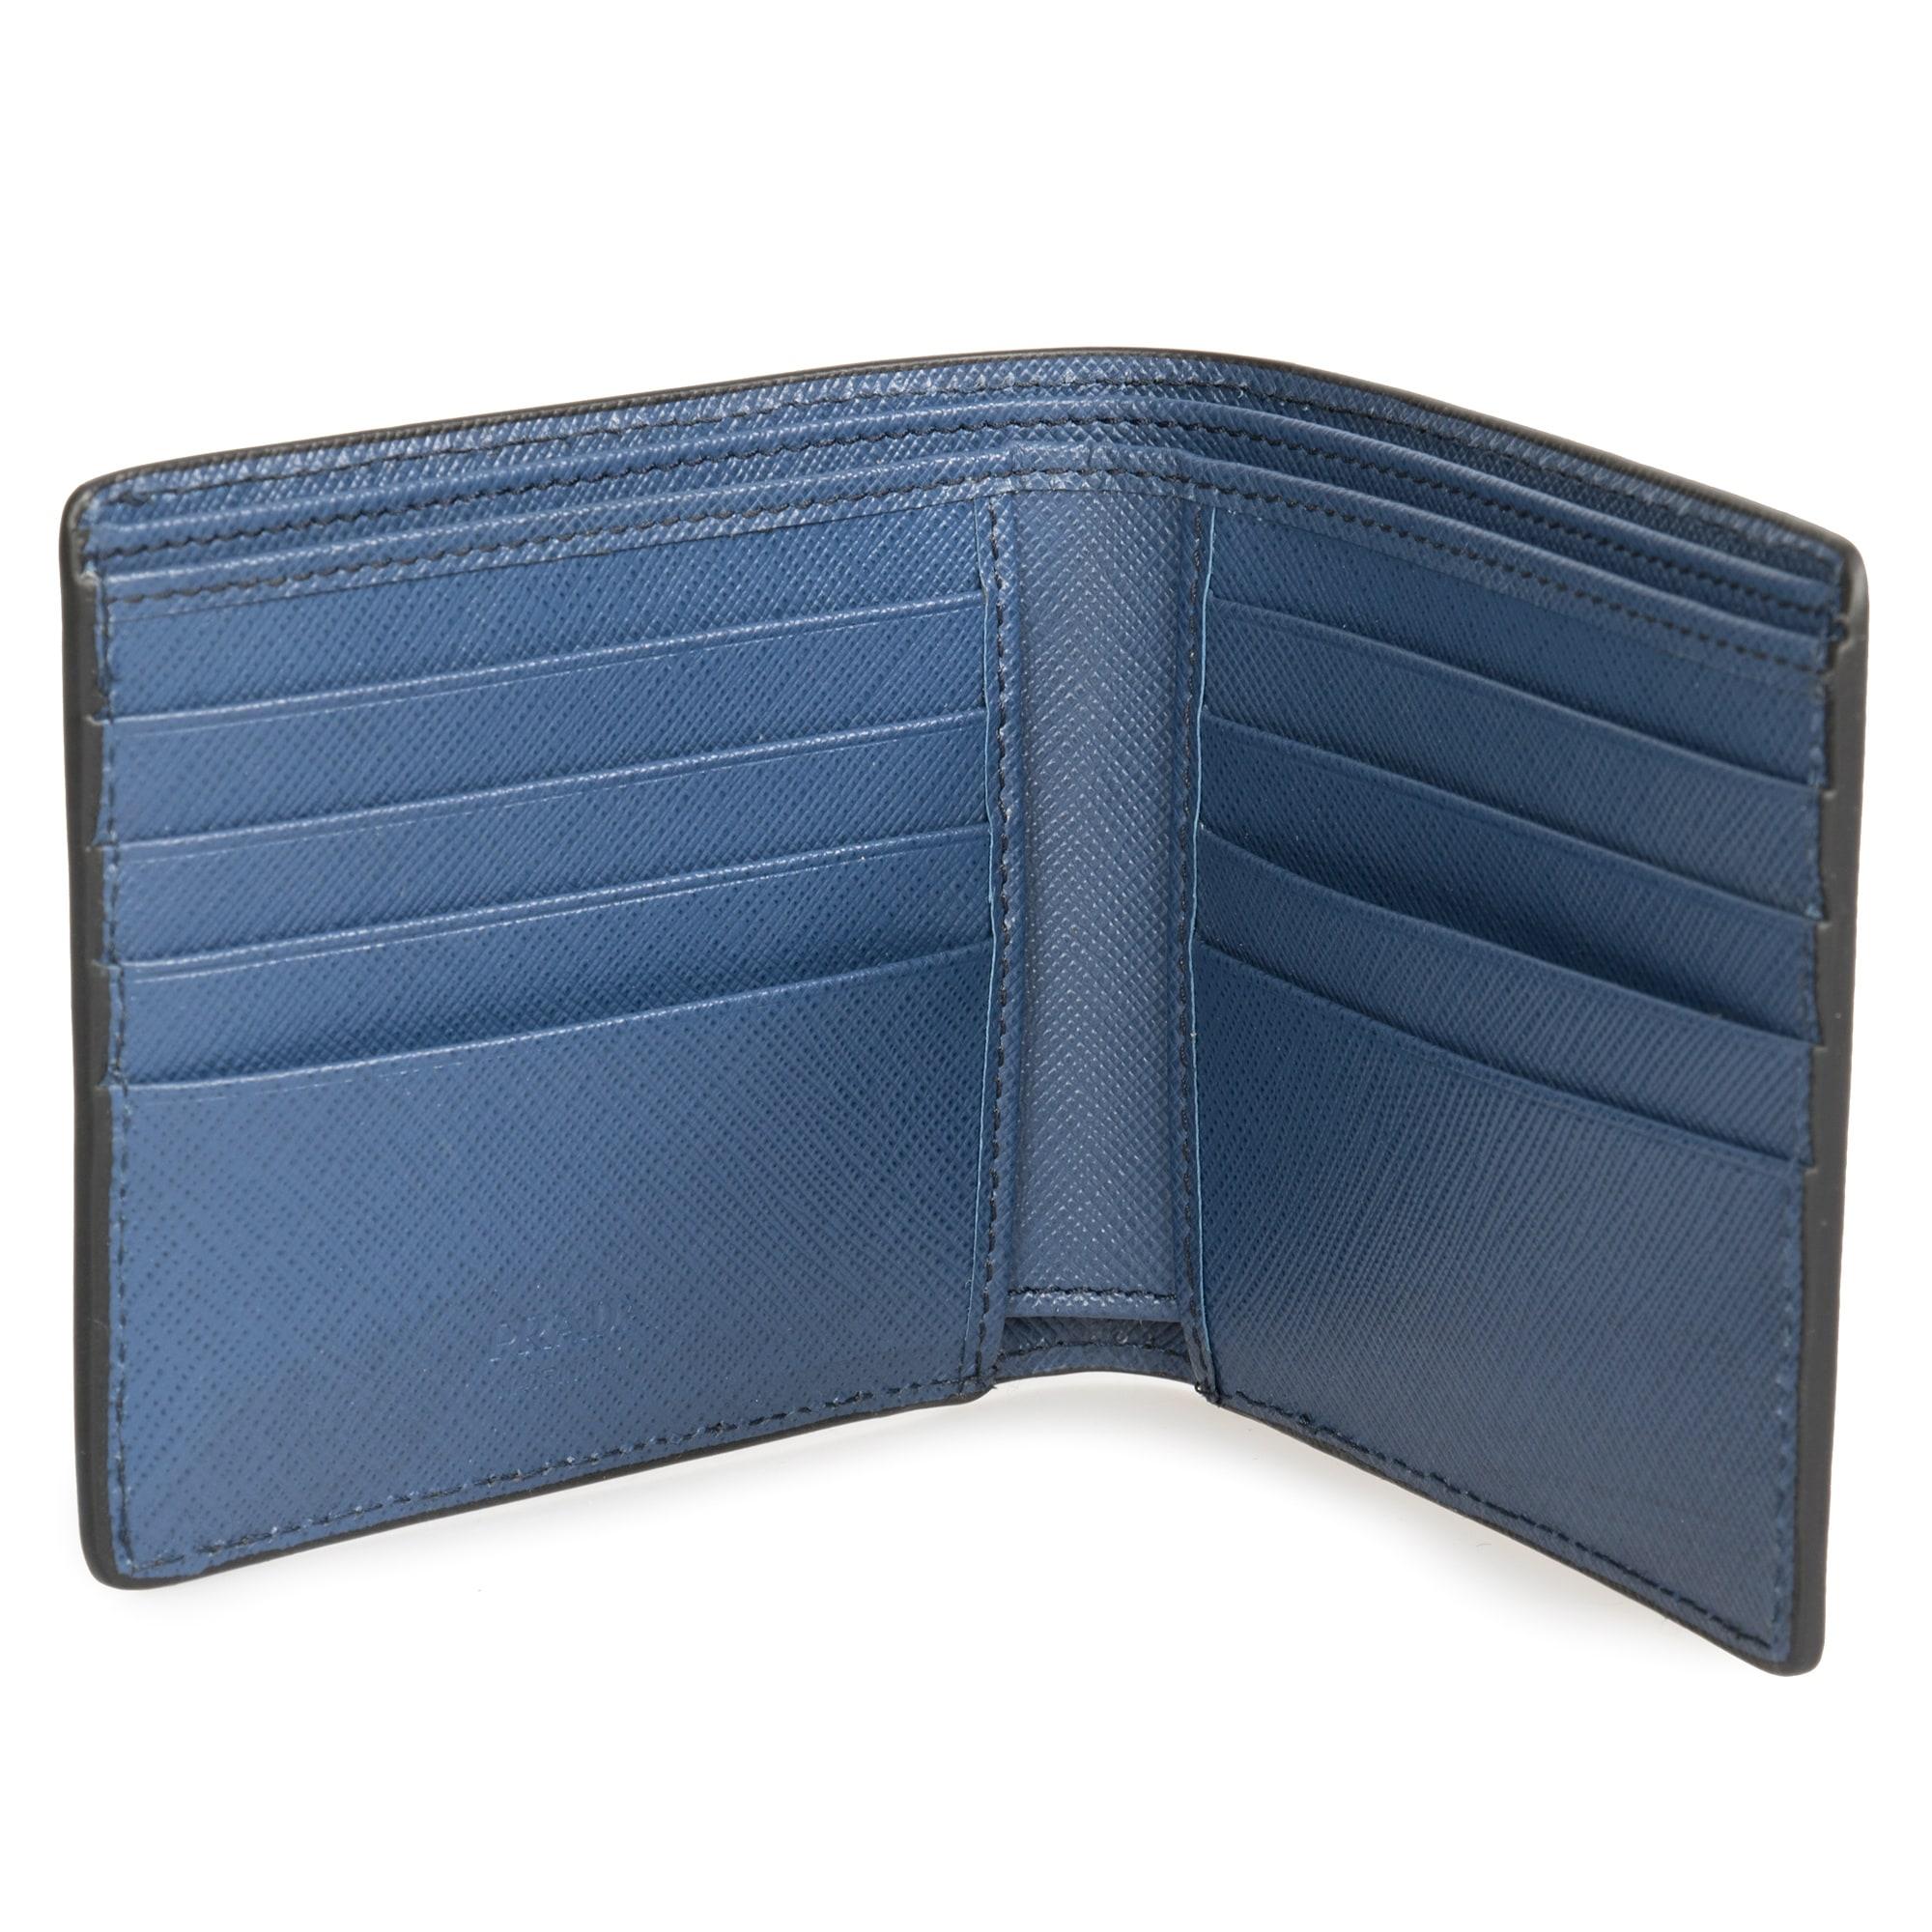 bcaa311c4752 ... australia shop prada black saffiano leather wallet 2mo513 qme f0002  free shipping today overstock 23076882 c3a88